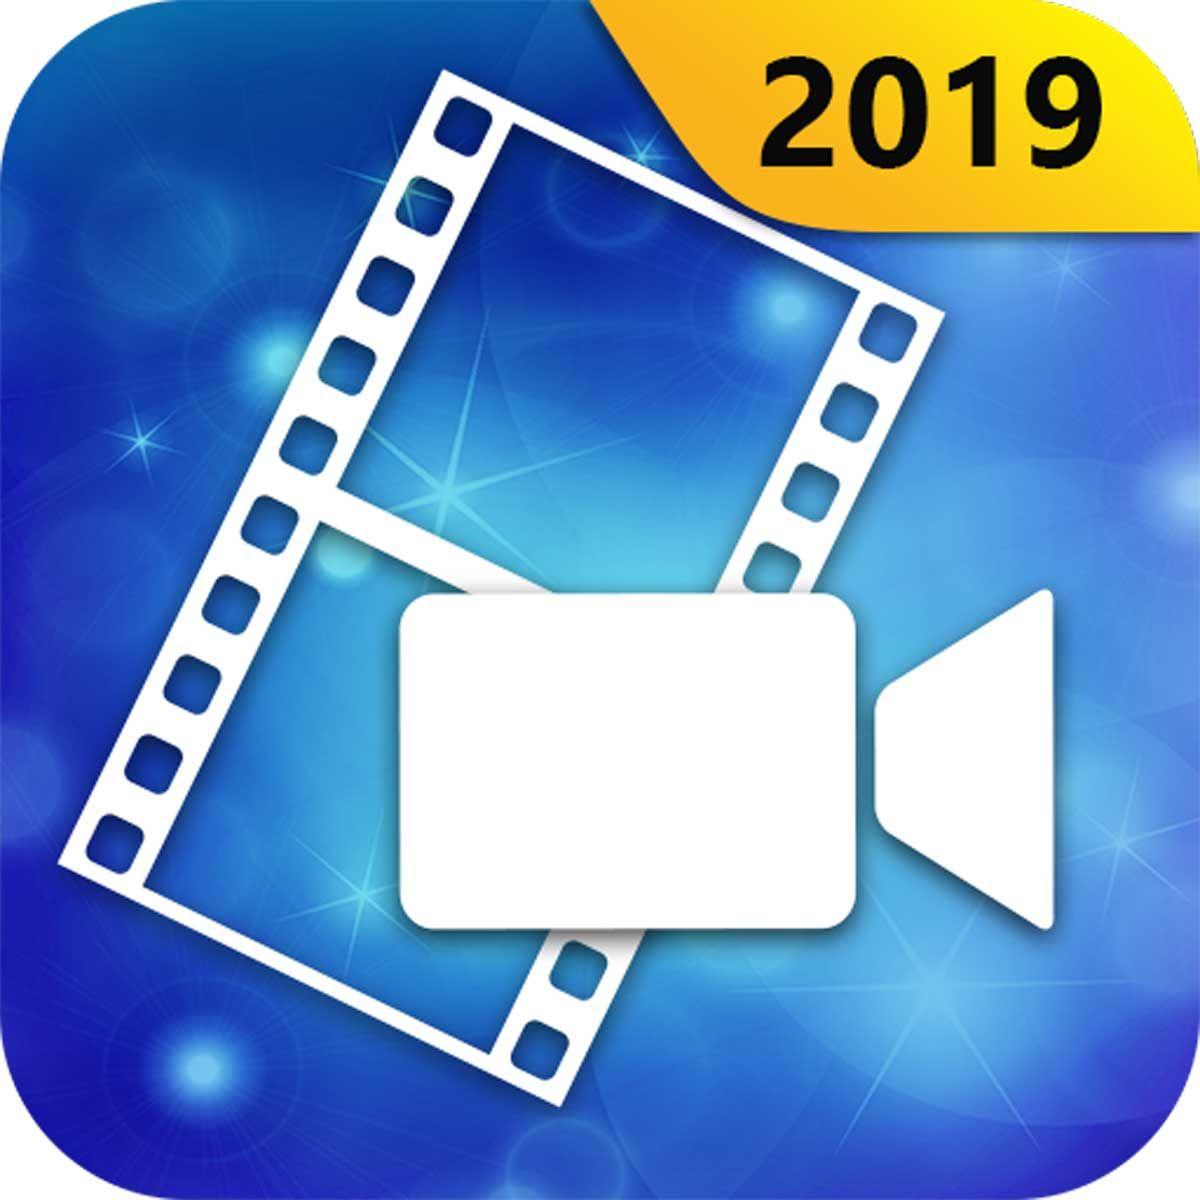 Powerdirector Mod 8 0 0 Apk Unlocked For Mobile Download Video Editing Apps Best Video Maker Video Editor